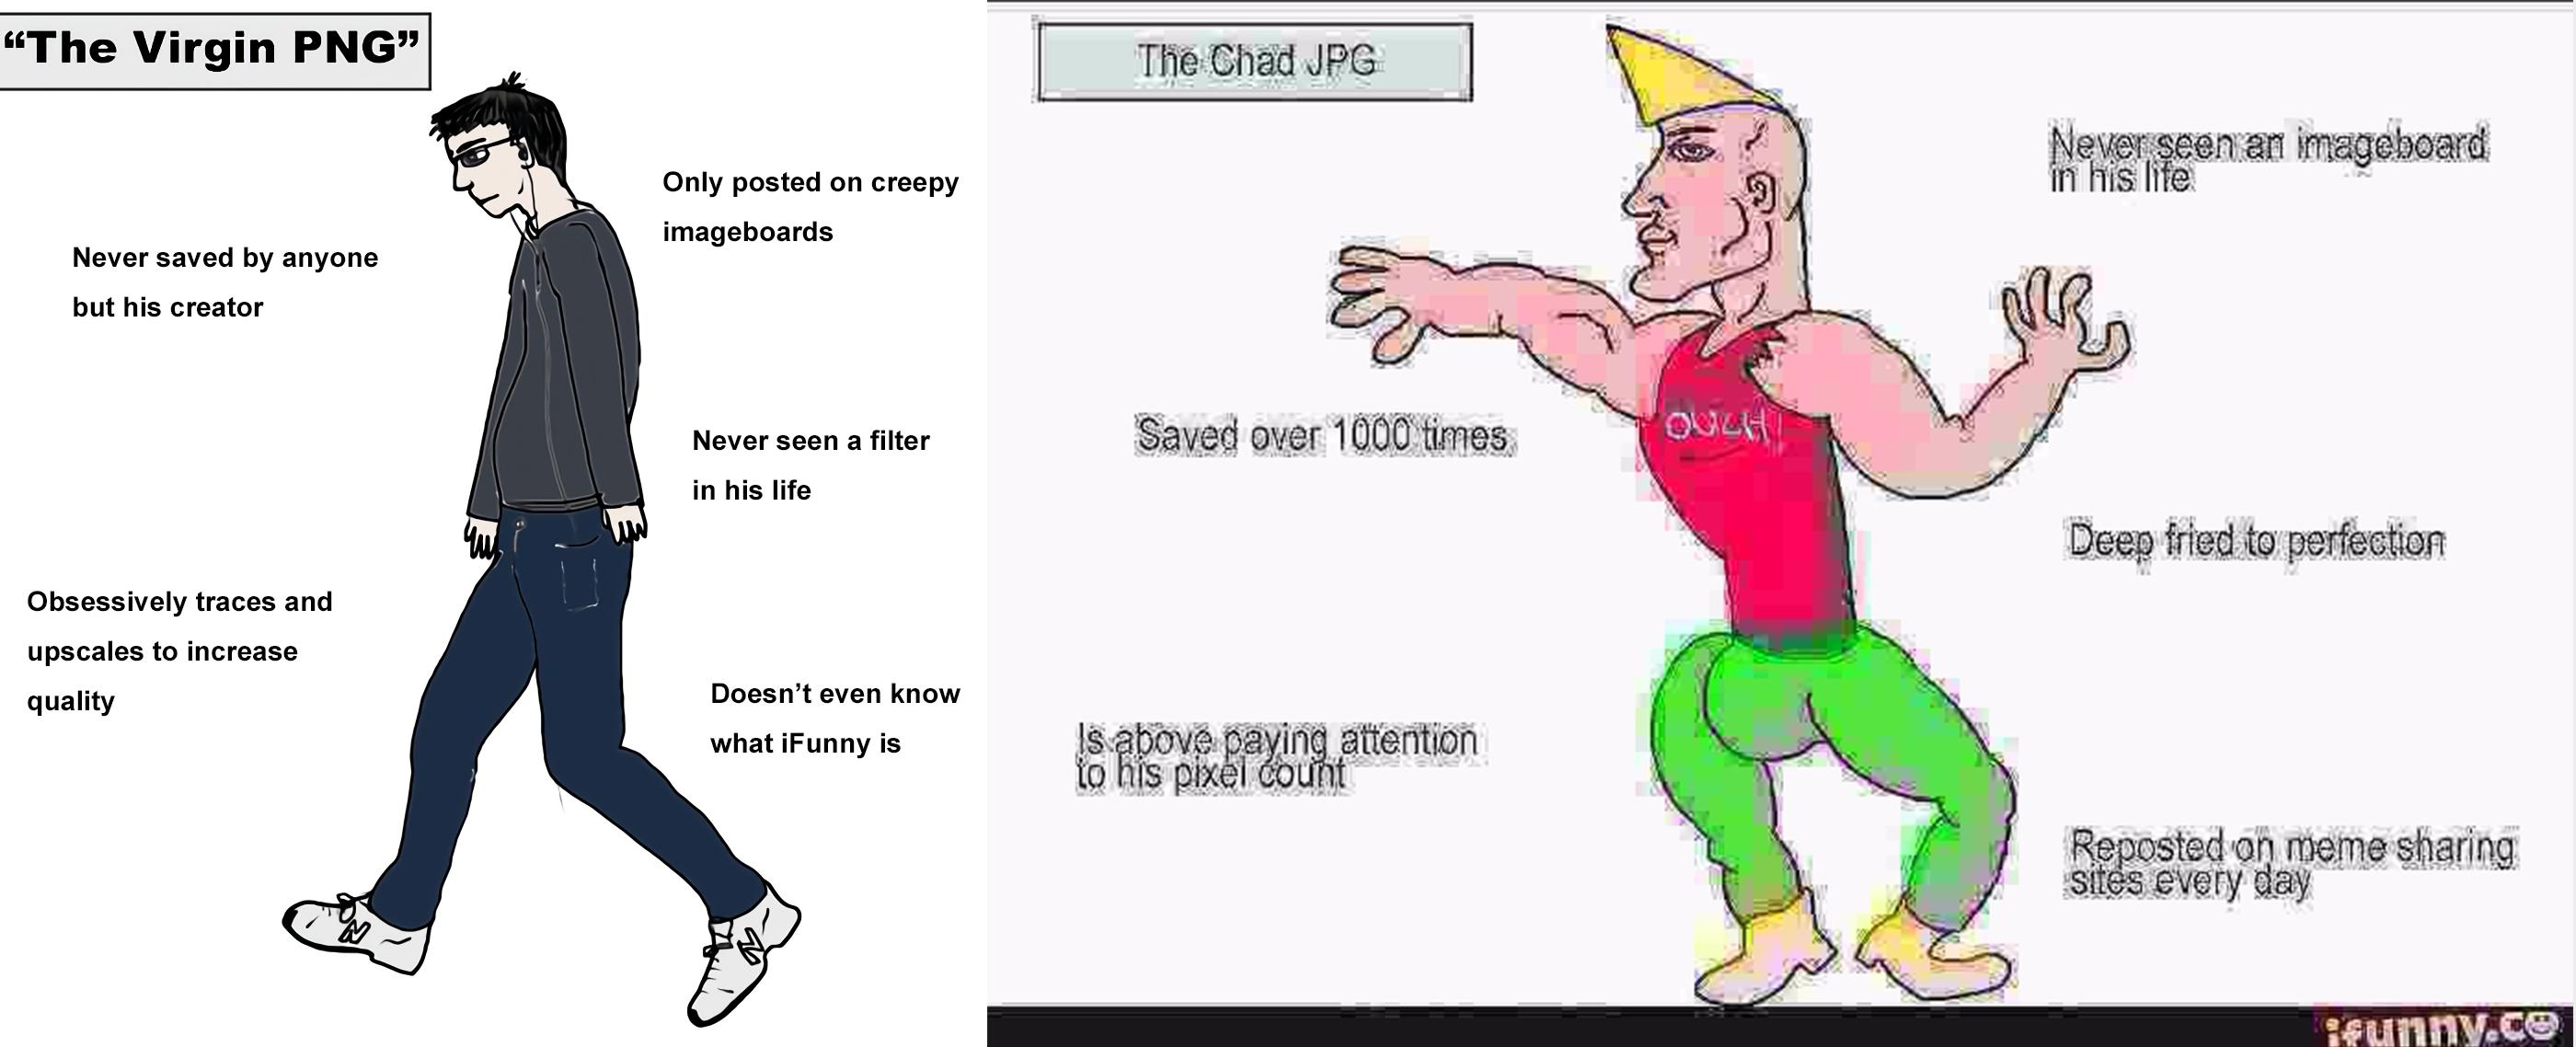 Similar to Virgin OC vs Chad repost